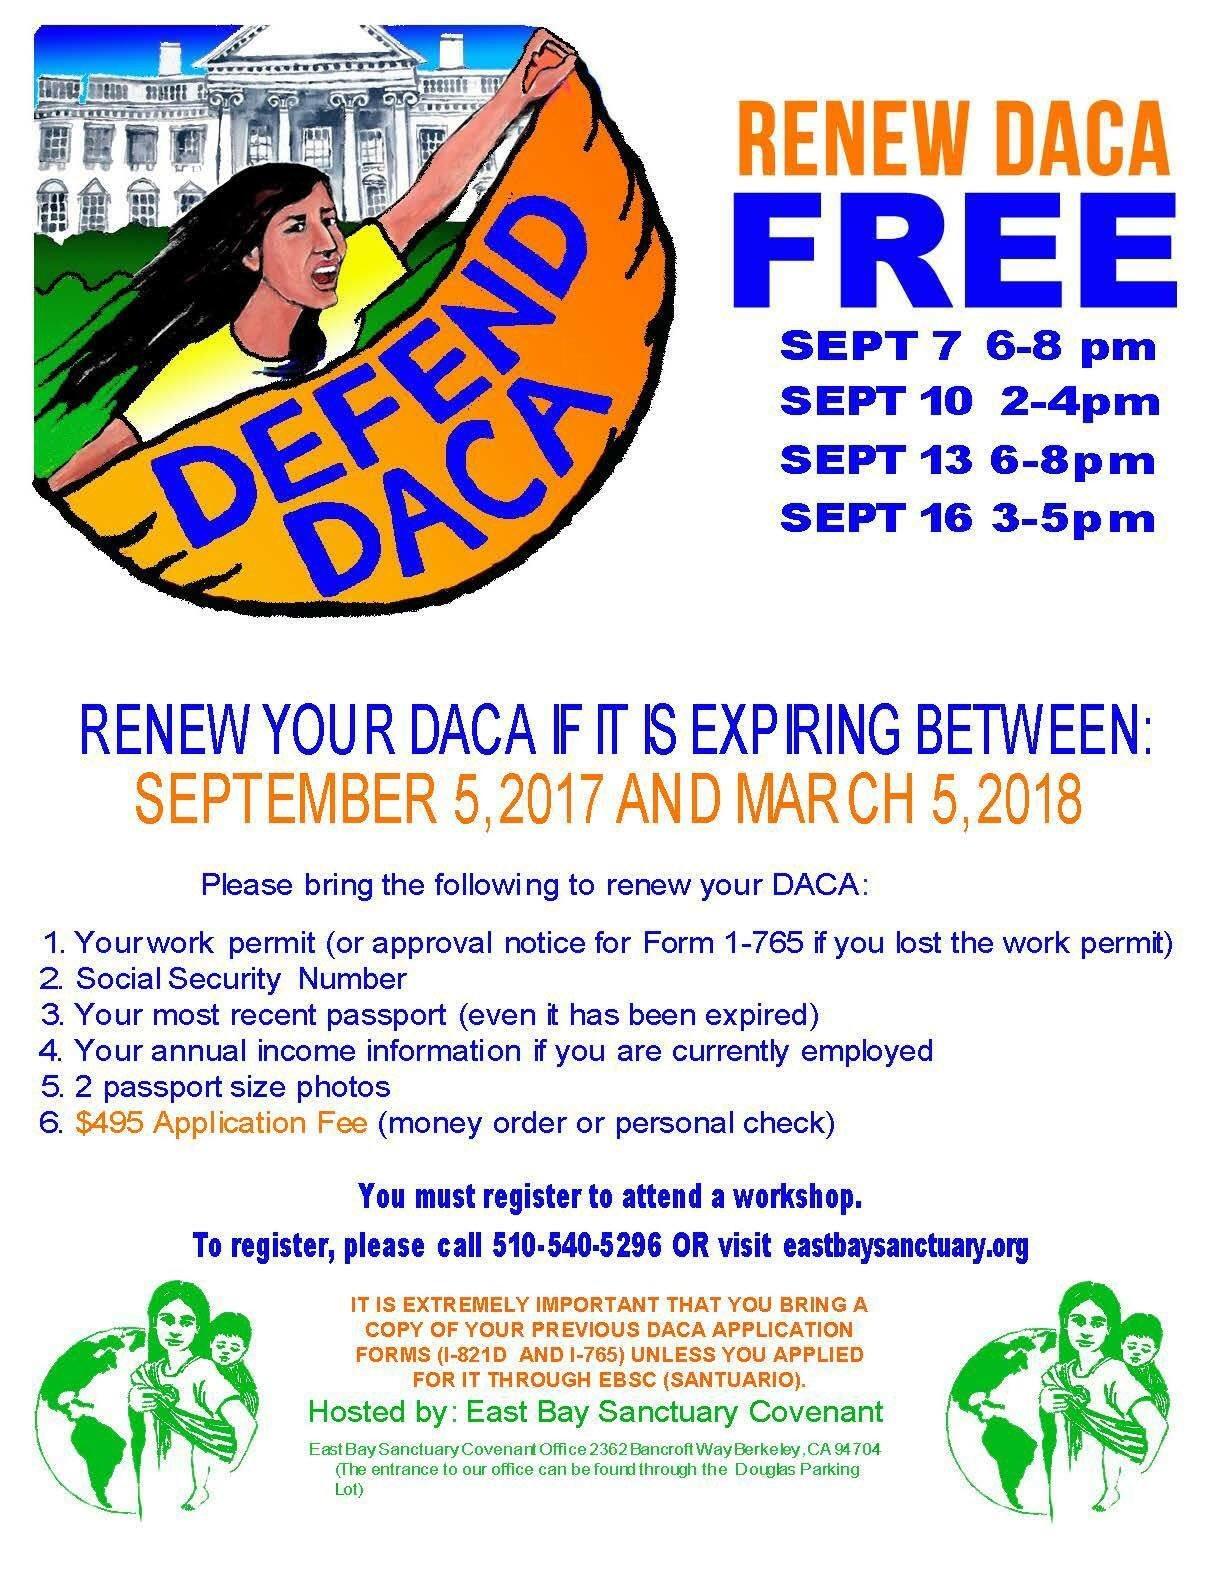 Renew DACA Free @ Register to get location.